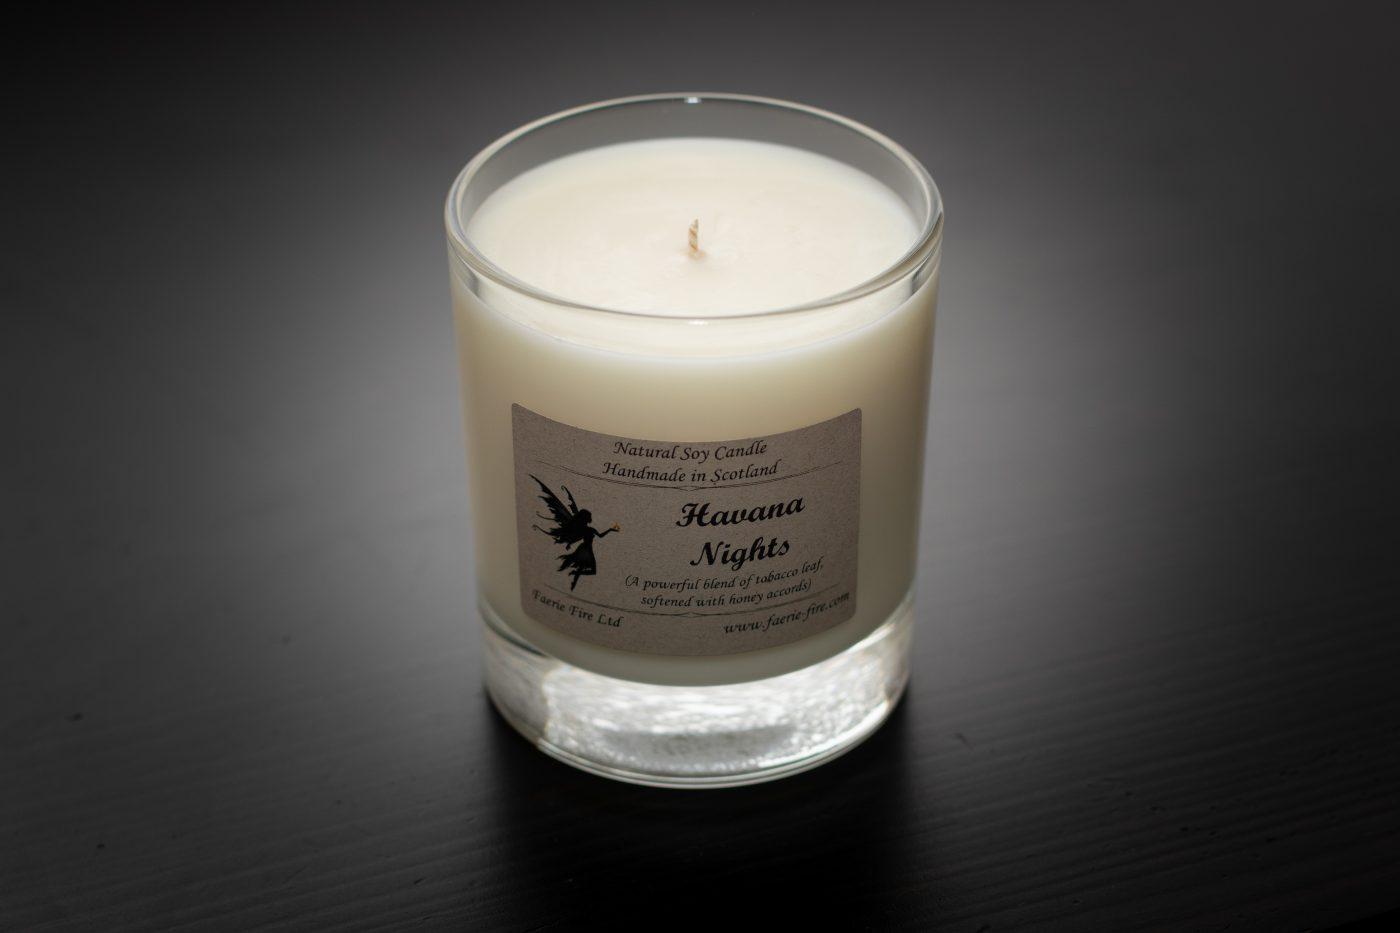 havana nights dark honey and tobacco fragranced white candle in a clear glass jar